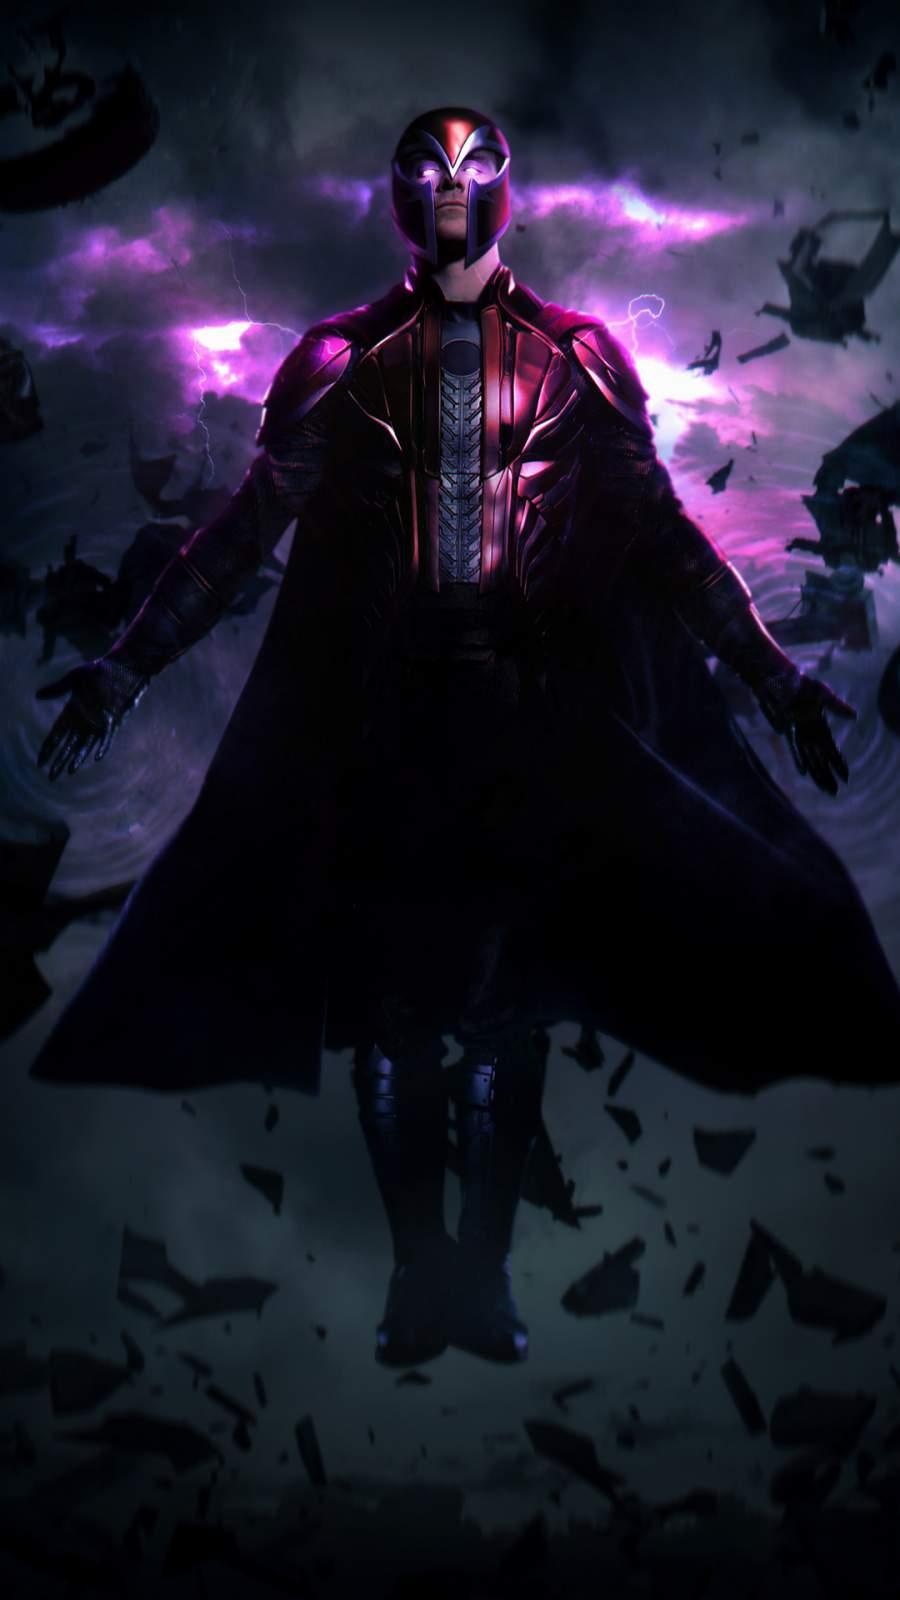 Magneto Artwork iPhone Wallpaper